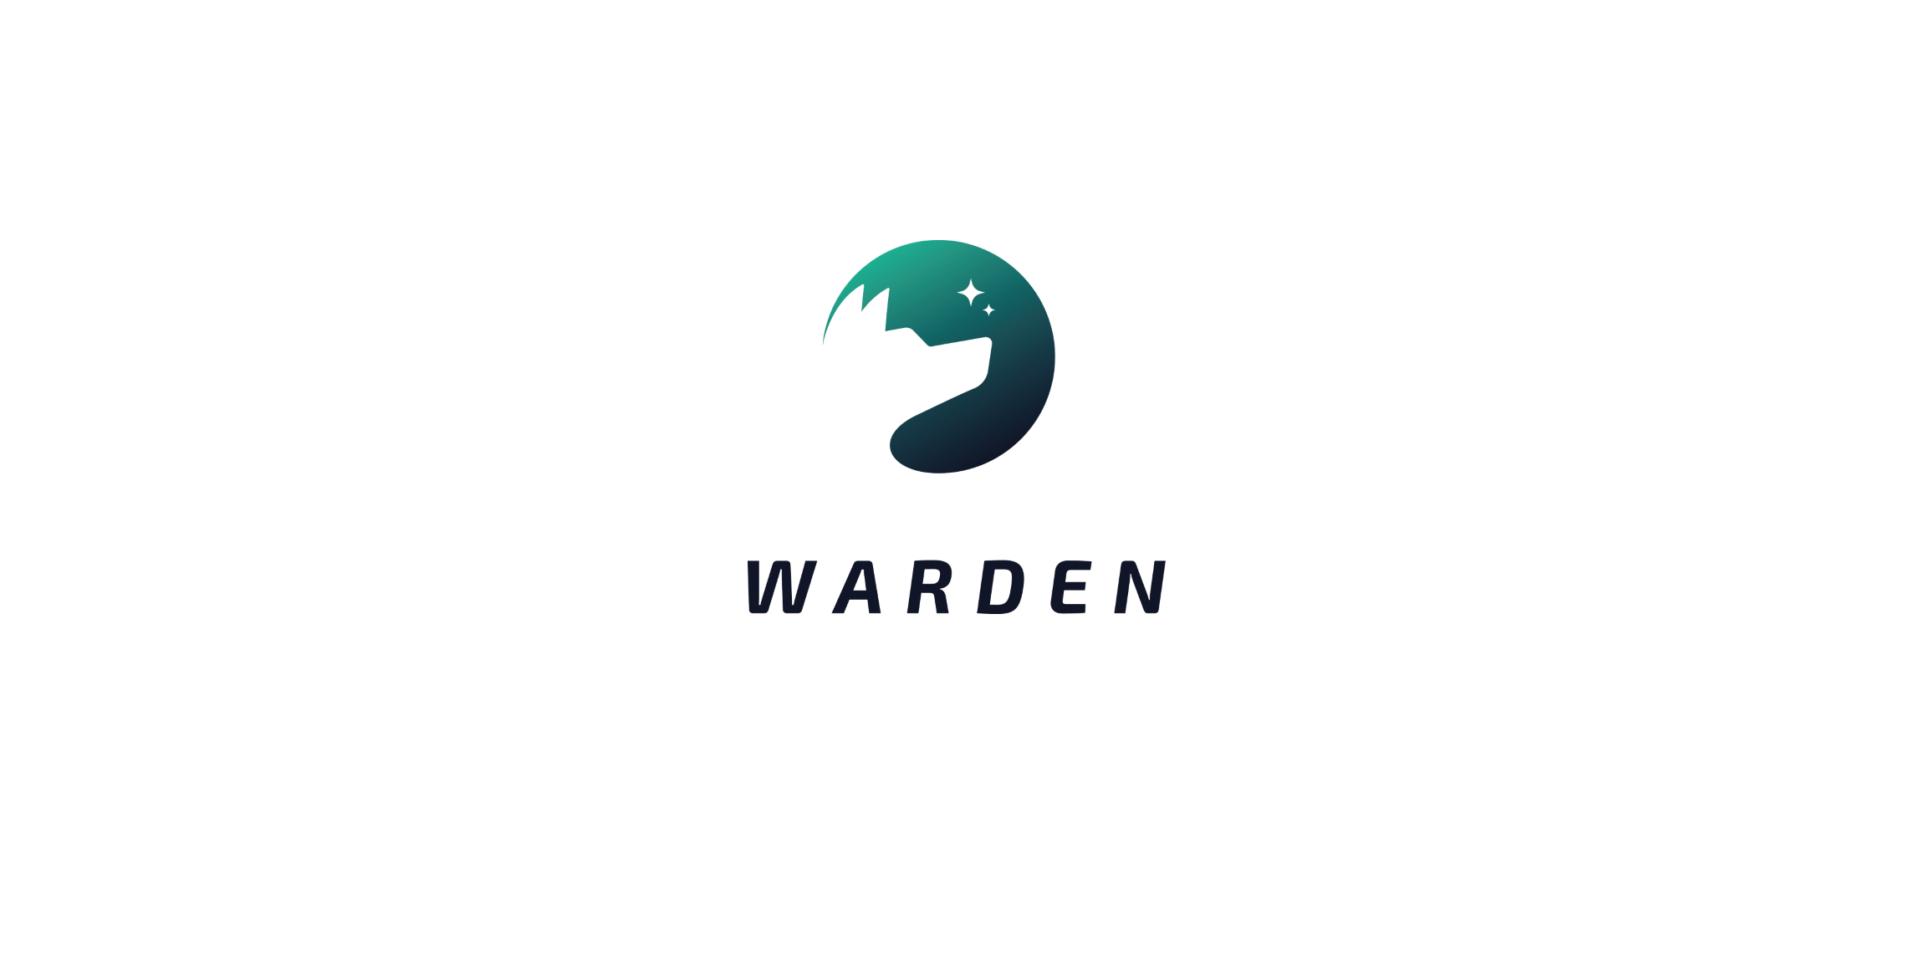 Warden 1.3.0 released